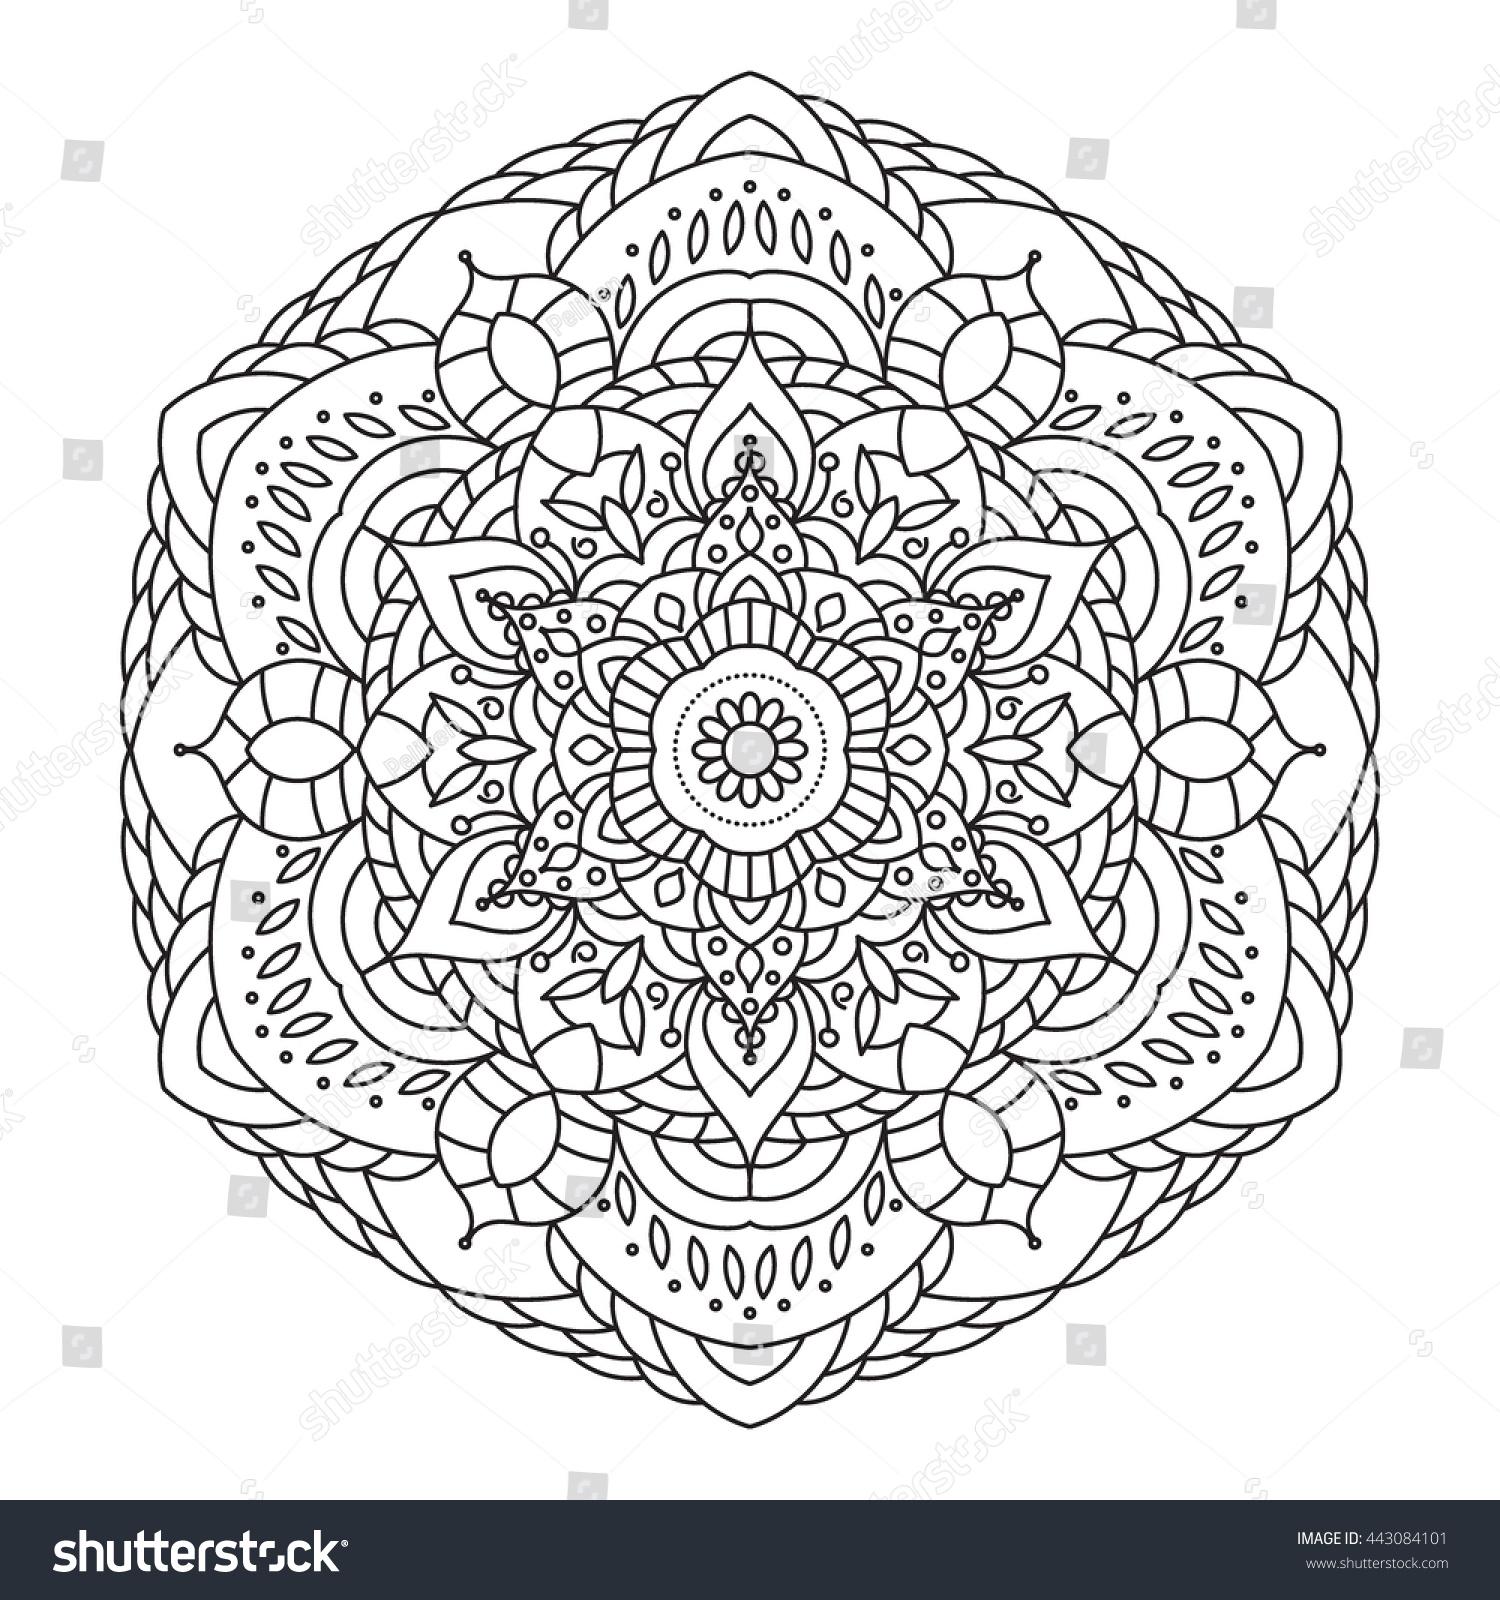 Mandala coloring book. Black and white lace pattern raster ...